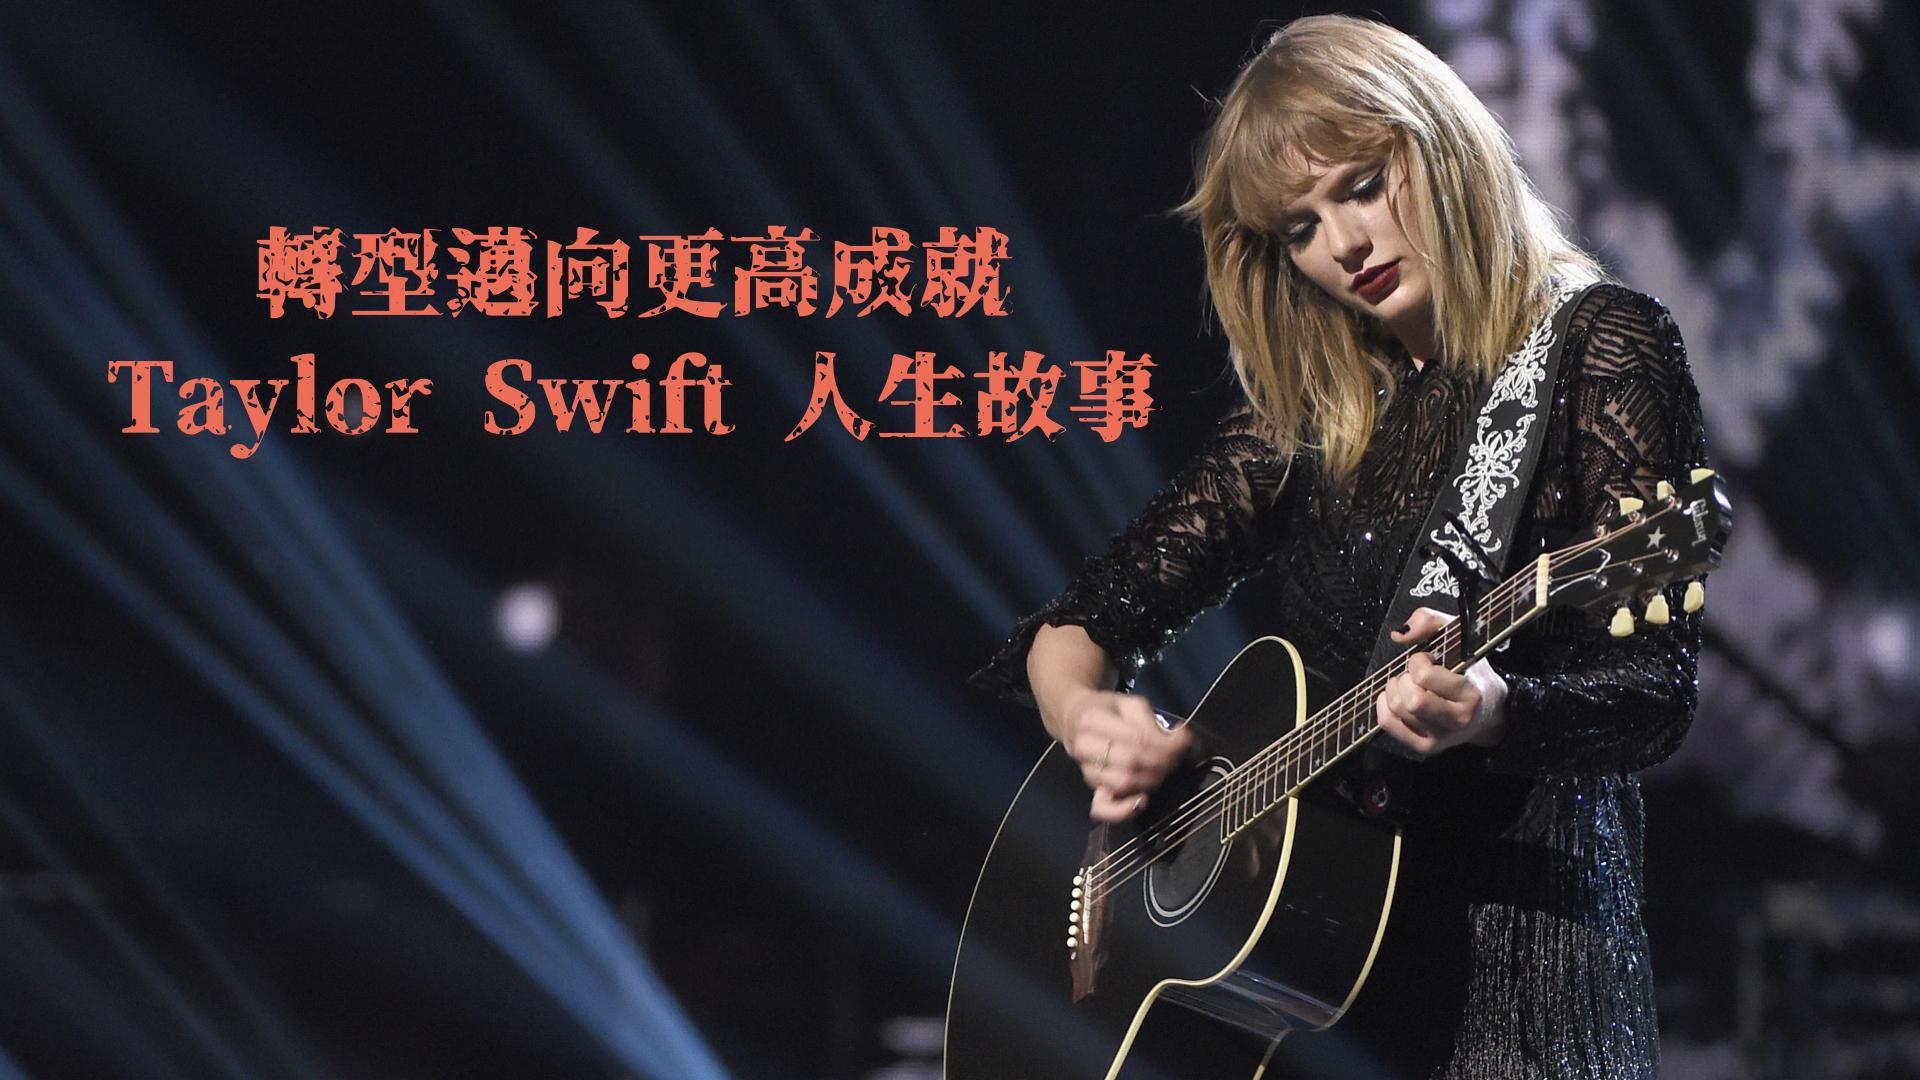 Taylor Swift 出道全介紹,從小鎮女孩到流行天後之路,與 Katy Perry, Kanye West 紛爭不斷